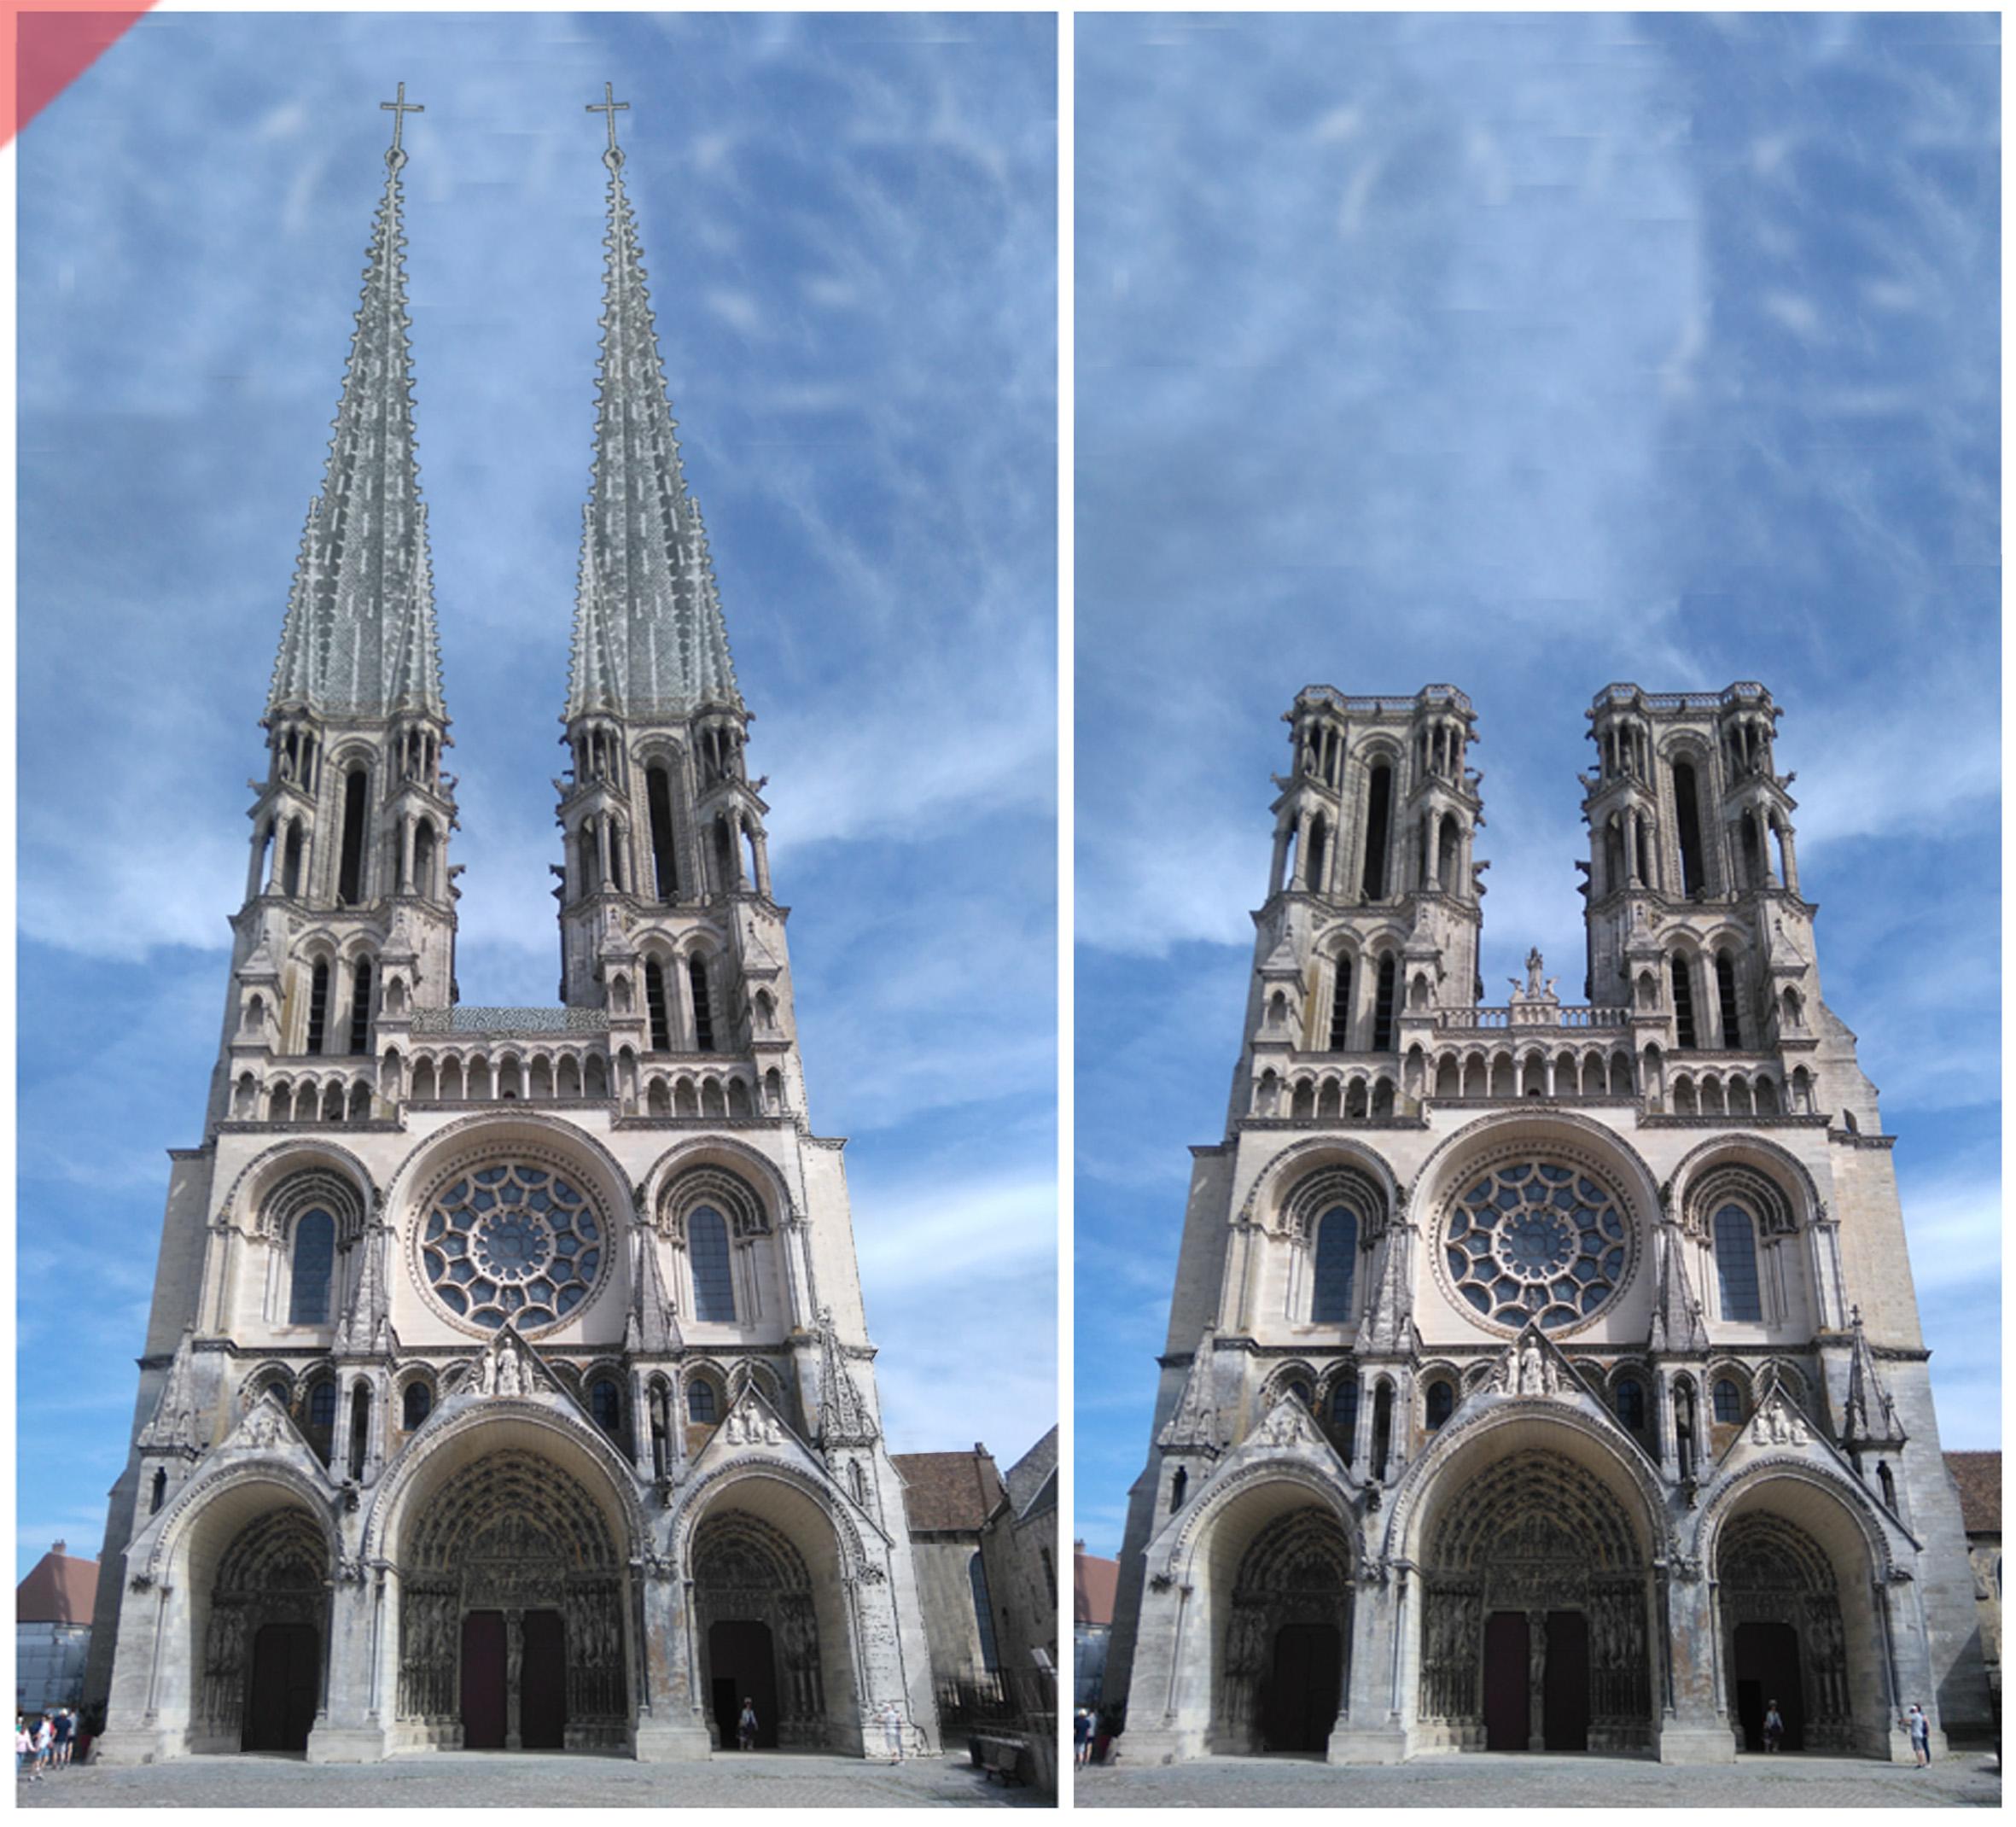 Laon-Cathédrale- plomb-vert-vol-drone-2-deux-tours-façade-aériennes-tours avant-toits-plane-alors-et-maintenant-Laon-cathedral-drone-flight-cathedrale-aerial view-green-2-two-towers-façade-west-pitched roof-then-and-now